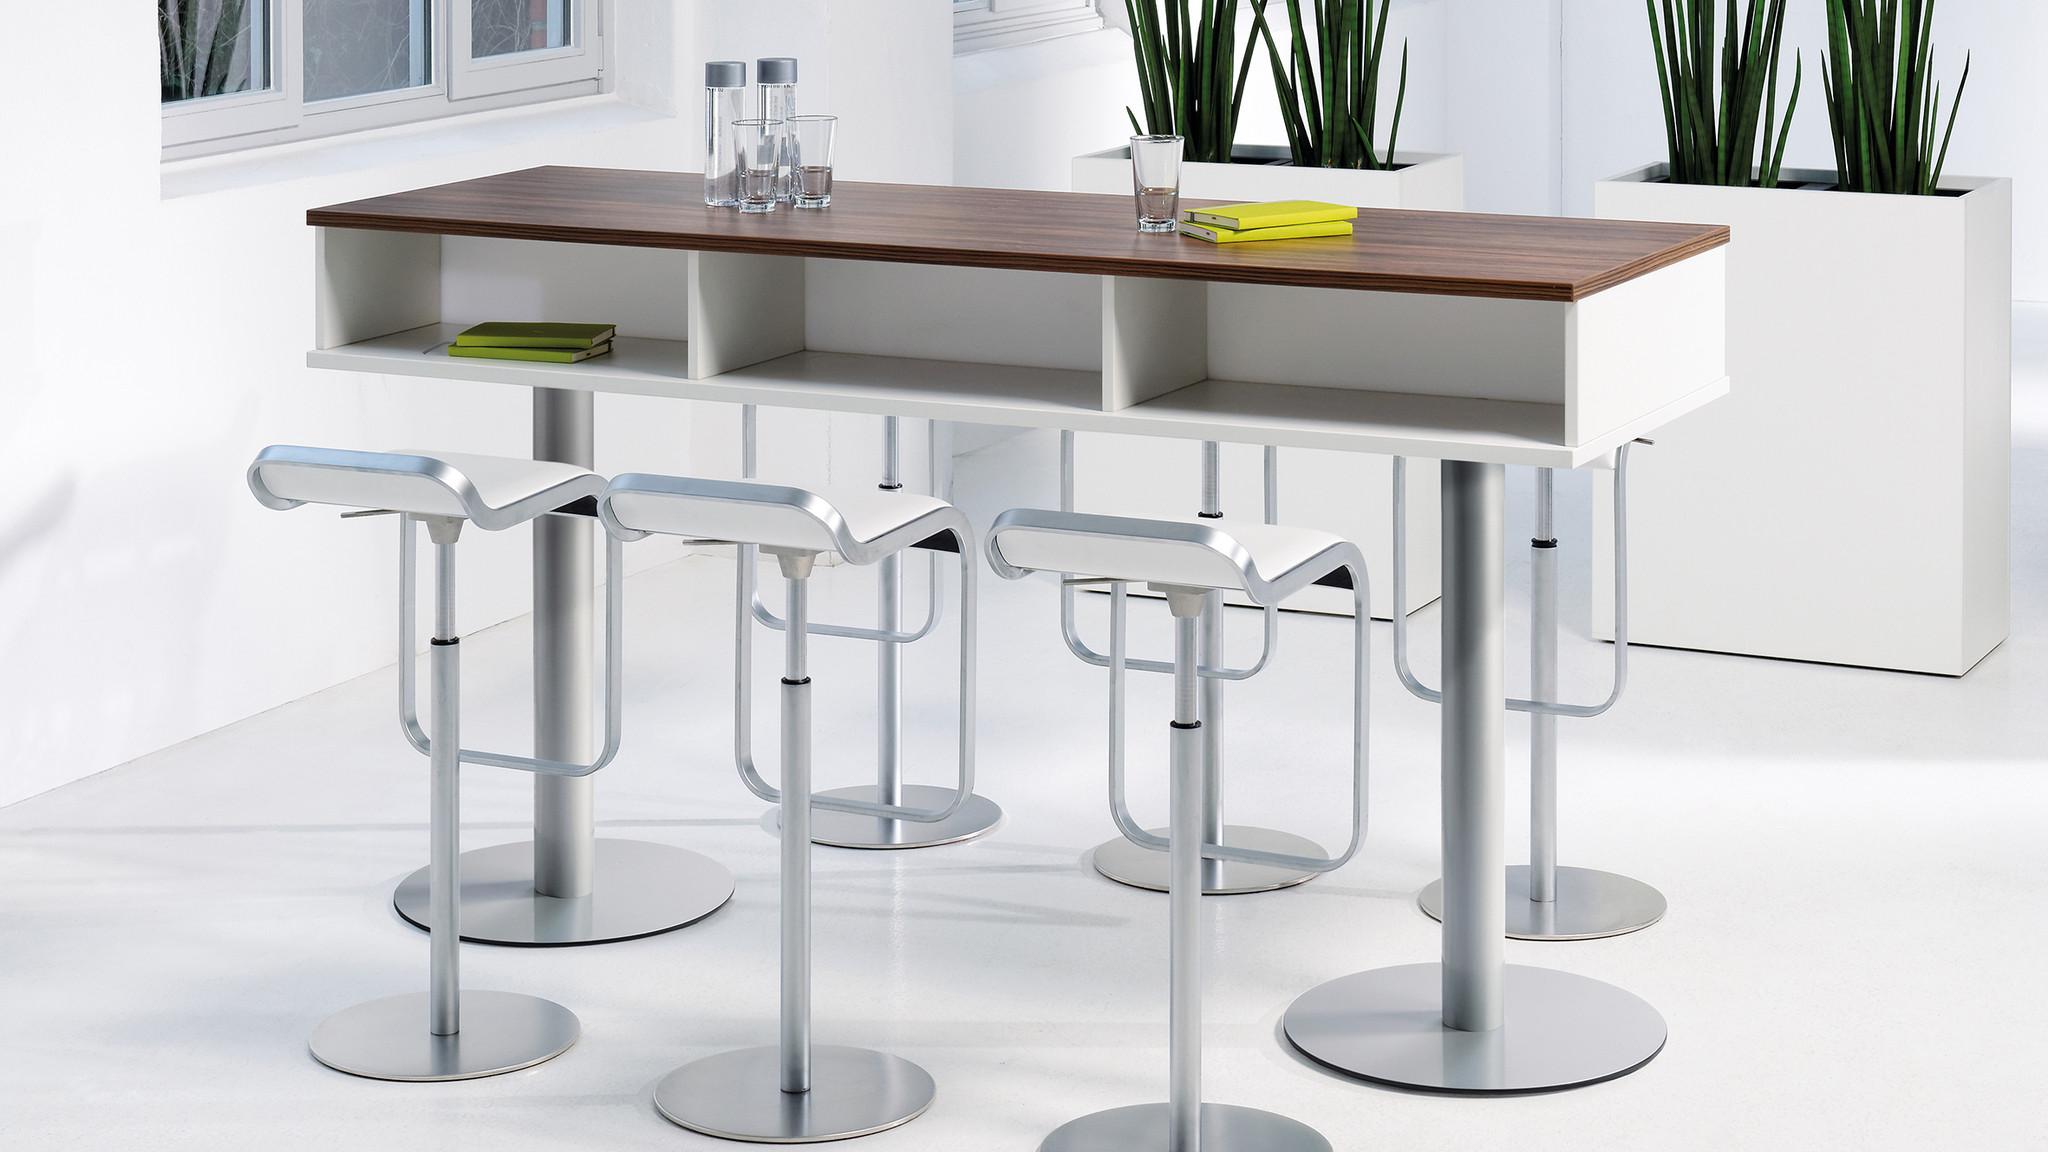 Büromöbel Siegen - Design